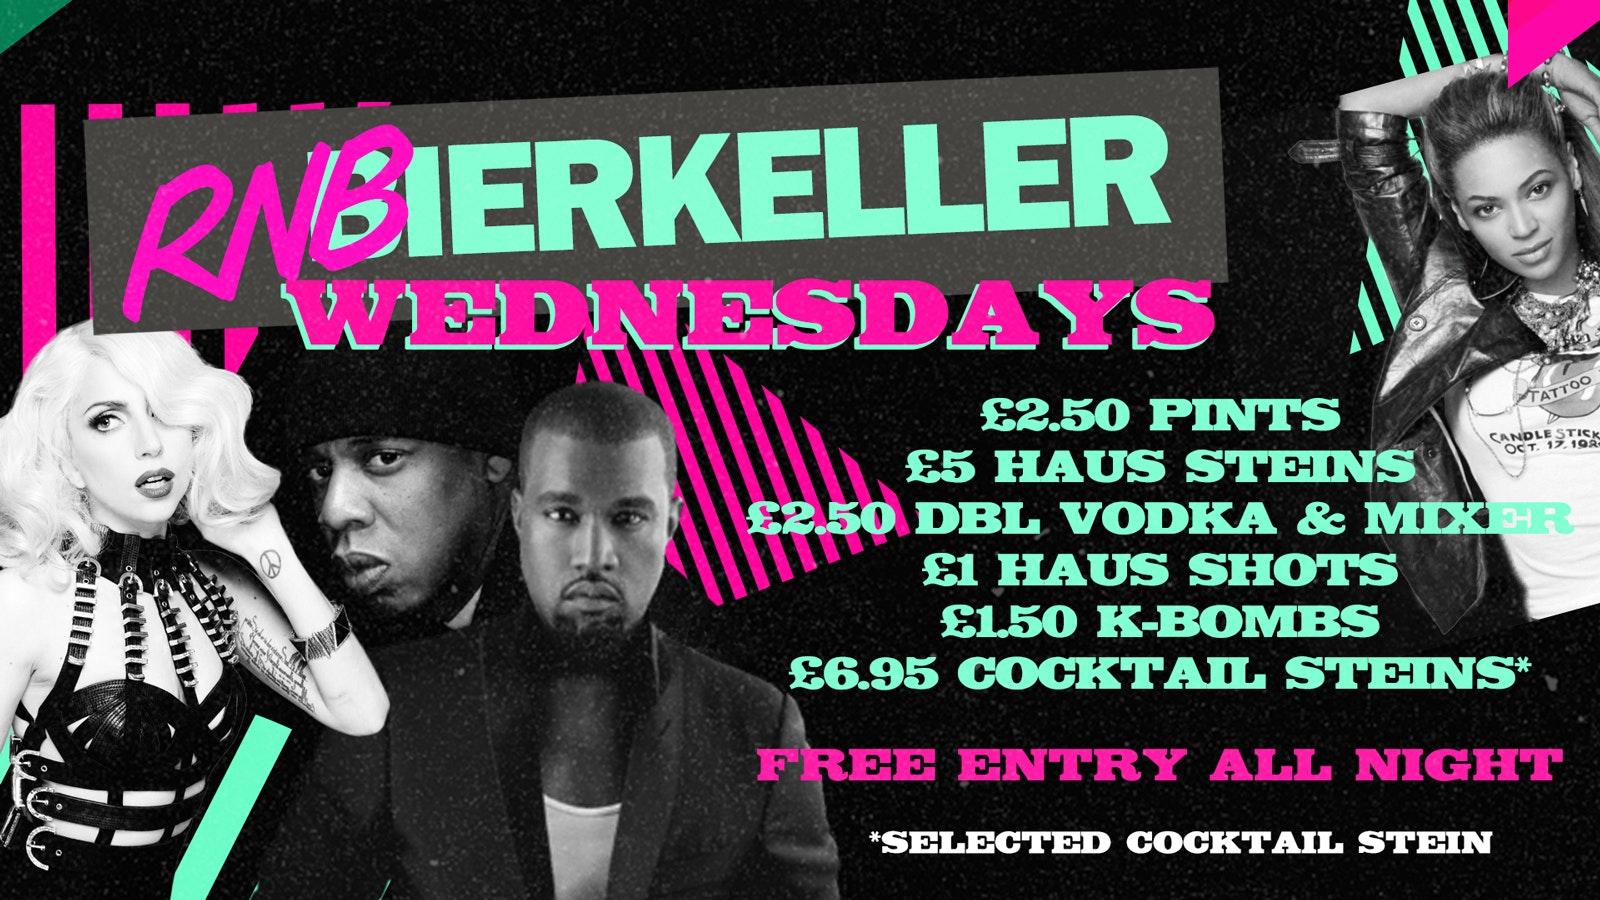 RnBierkeller – Wednesday